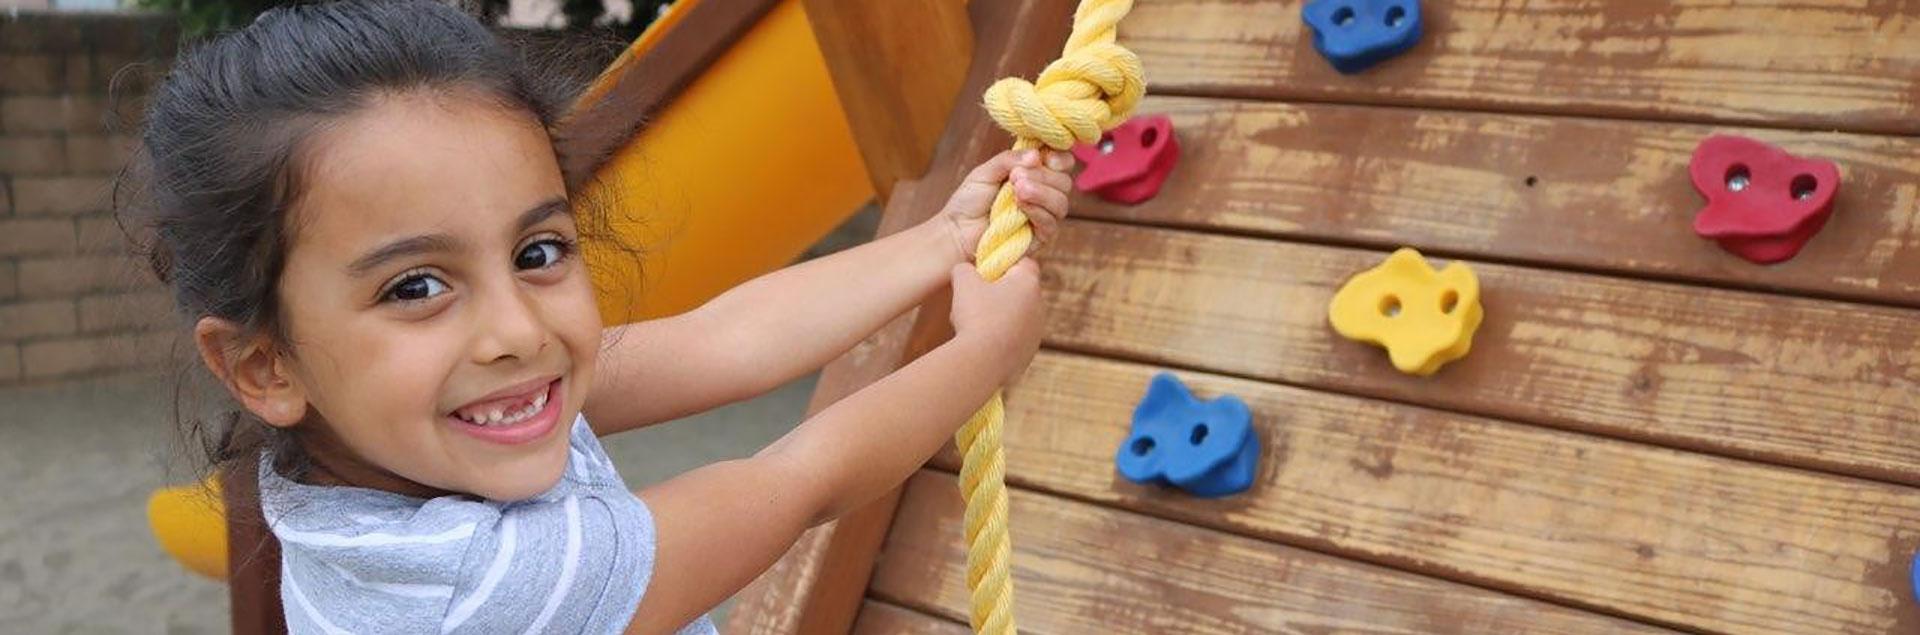 Girl climbing playground wall